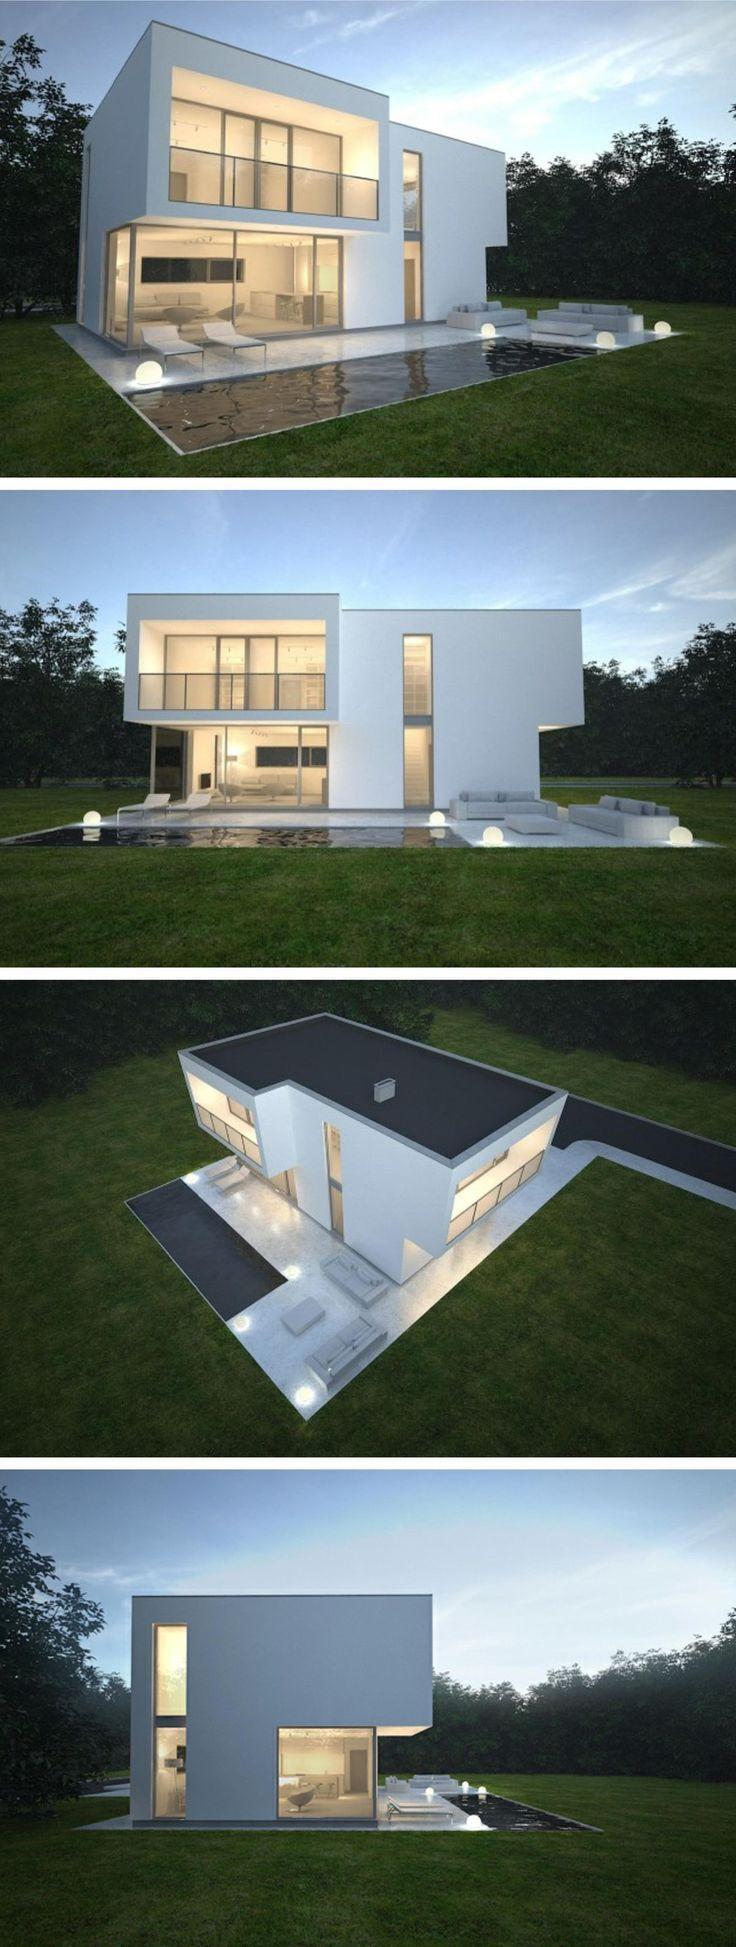 Queensland australia 7 modern home design ideas lakbermagazin - Modern House Design Architecture 25c9e73c3a2628ba5ba34b55761aa525 Jpg 1 2003 175 Pixel